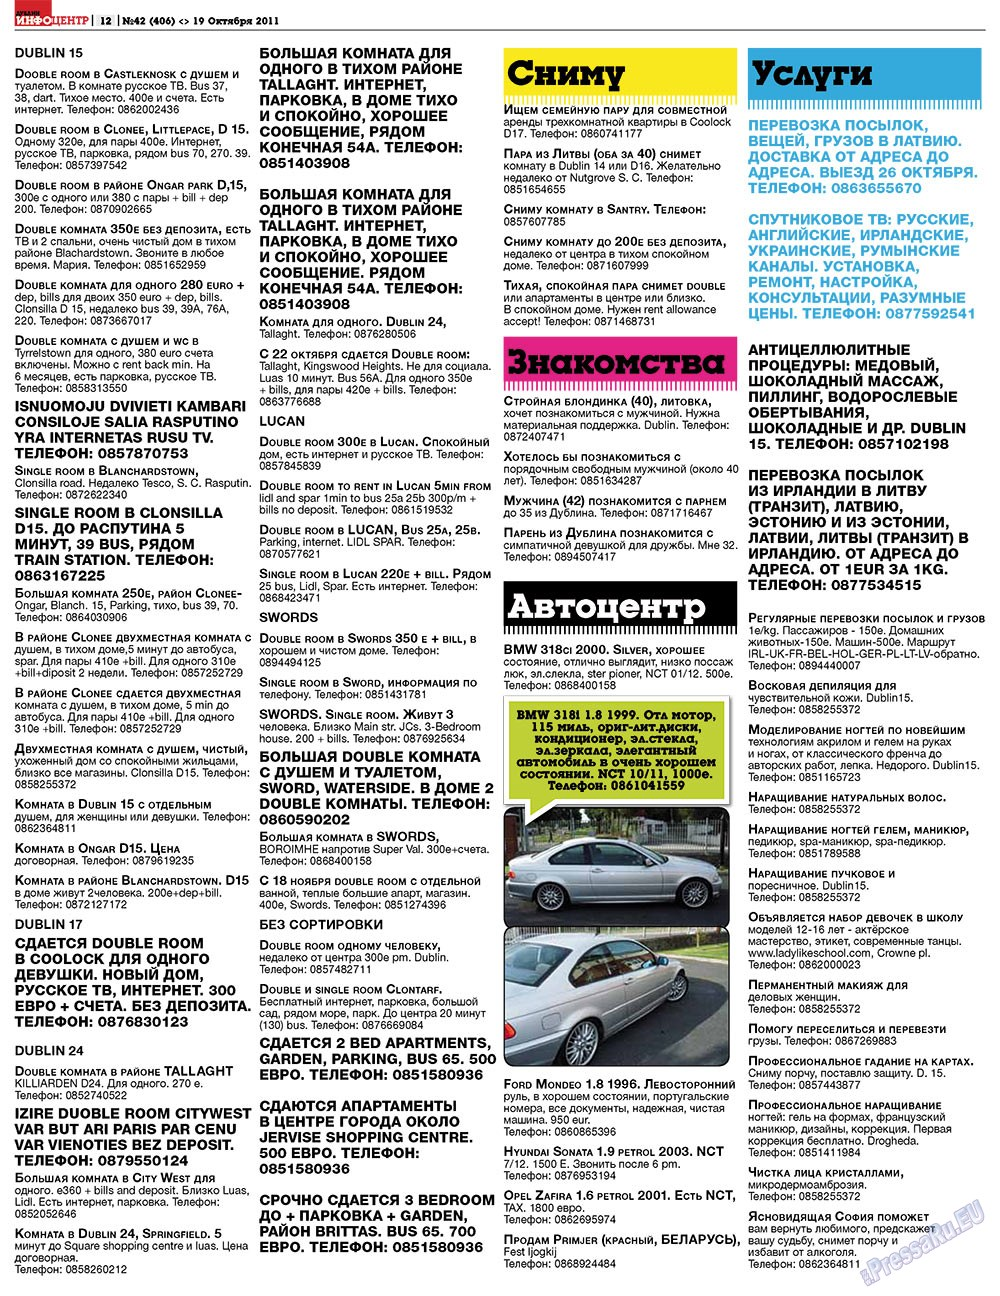 Дублин инфоцентр (газета). 2011 год, номер 42, стр. 12